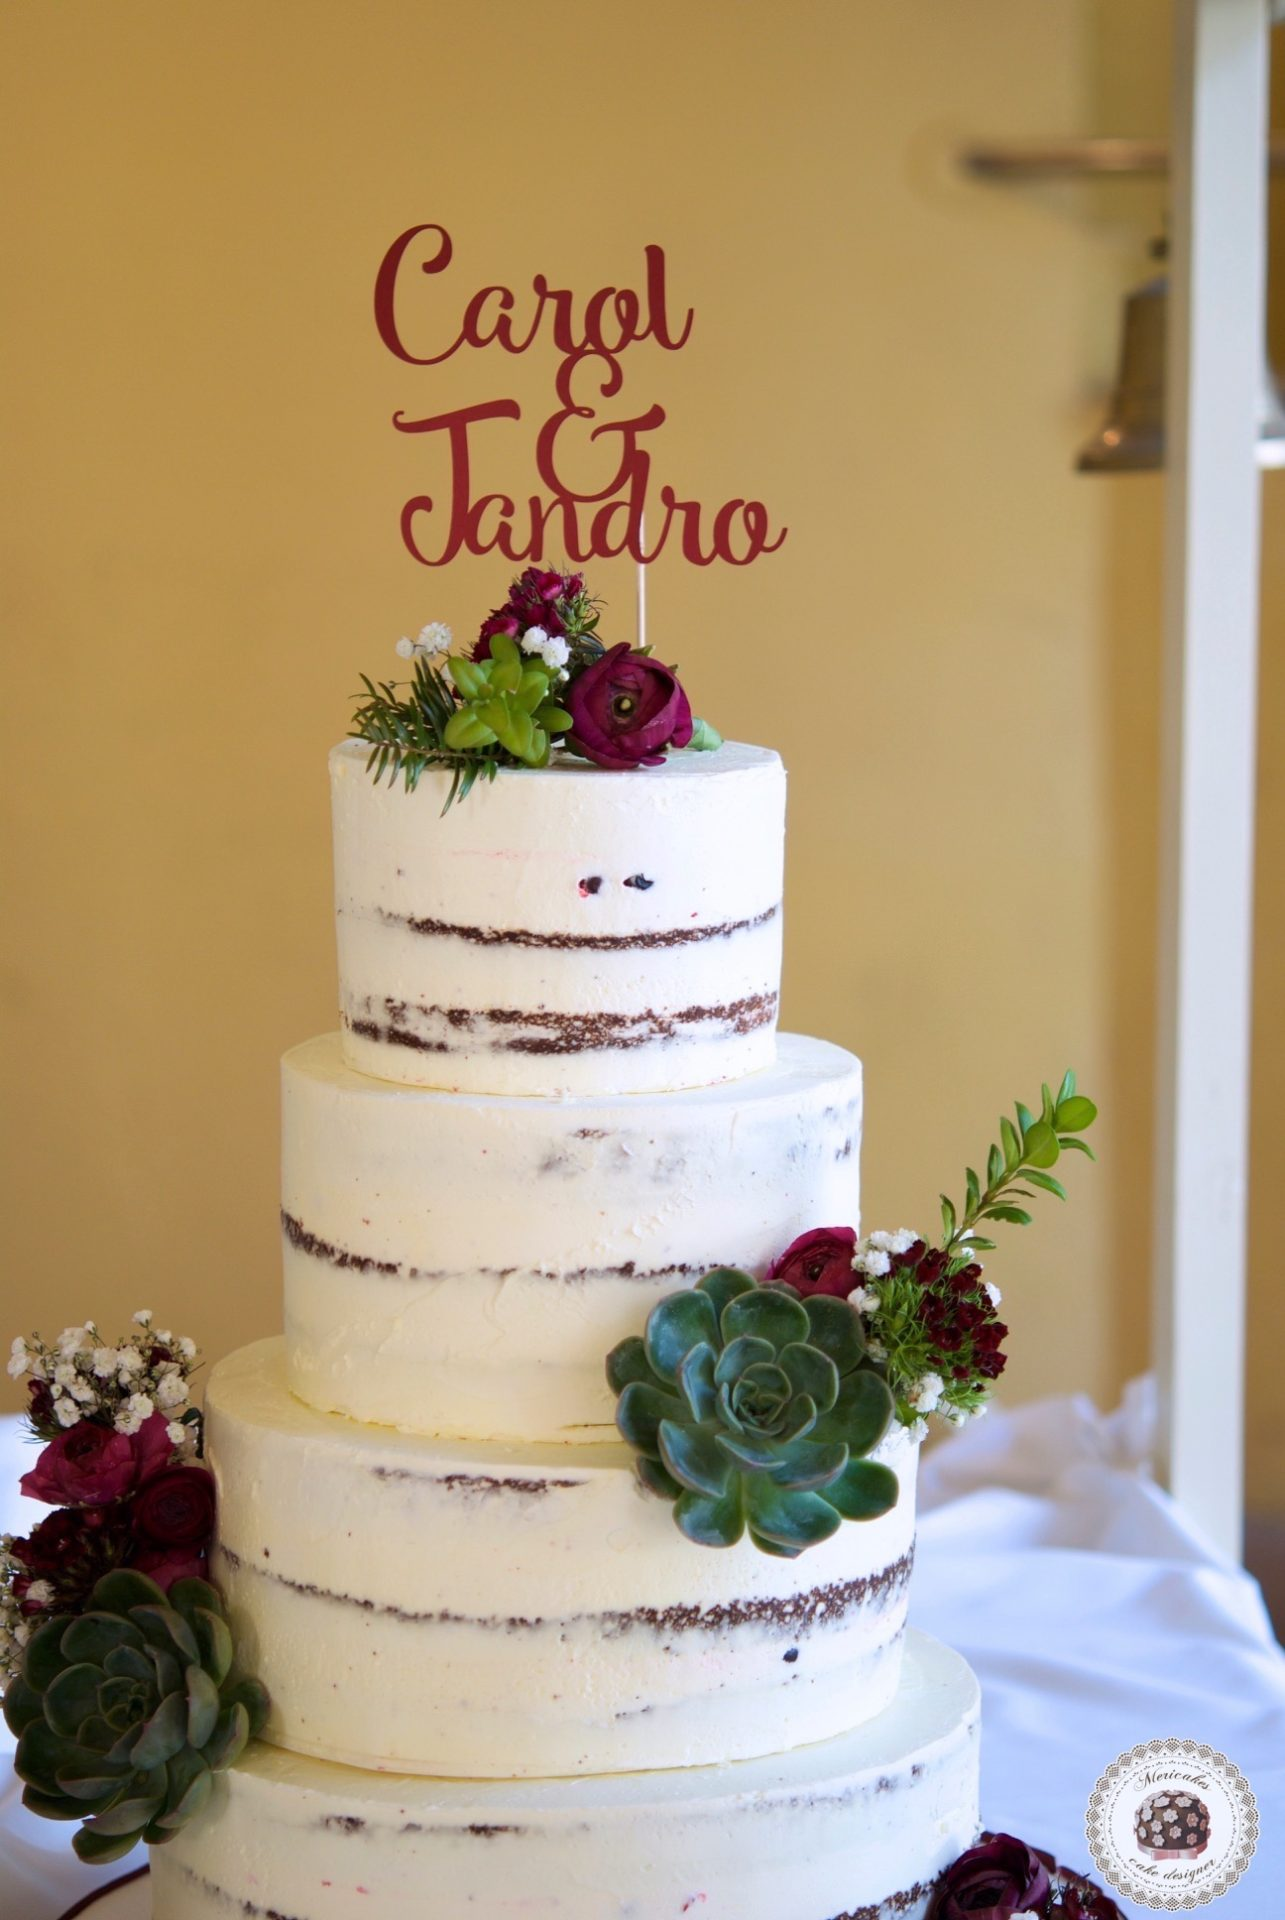 Wedding cake, tarta de boda, naked cake, semi naked, mericakes, just married, espai can pages, spain wedding, carol y jandro, just married, red velvet 6